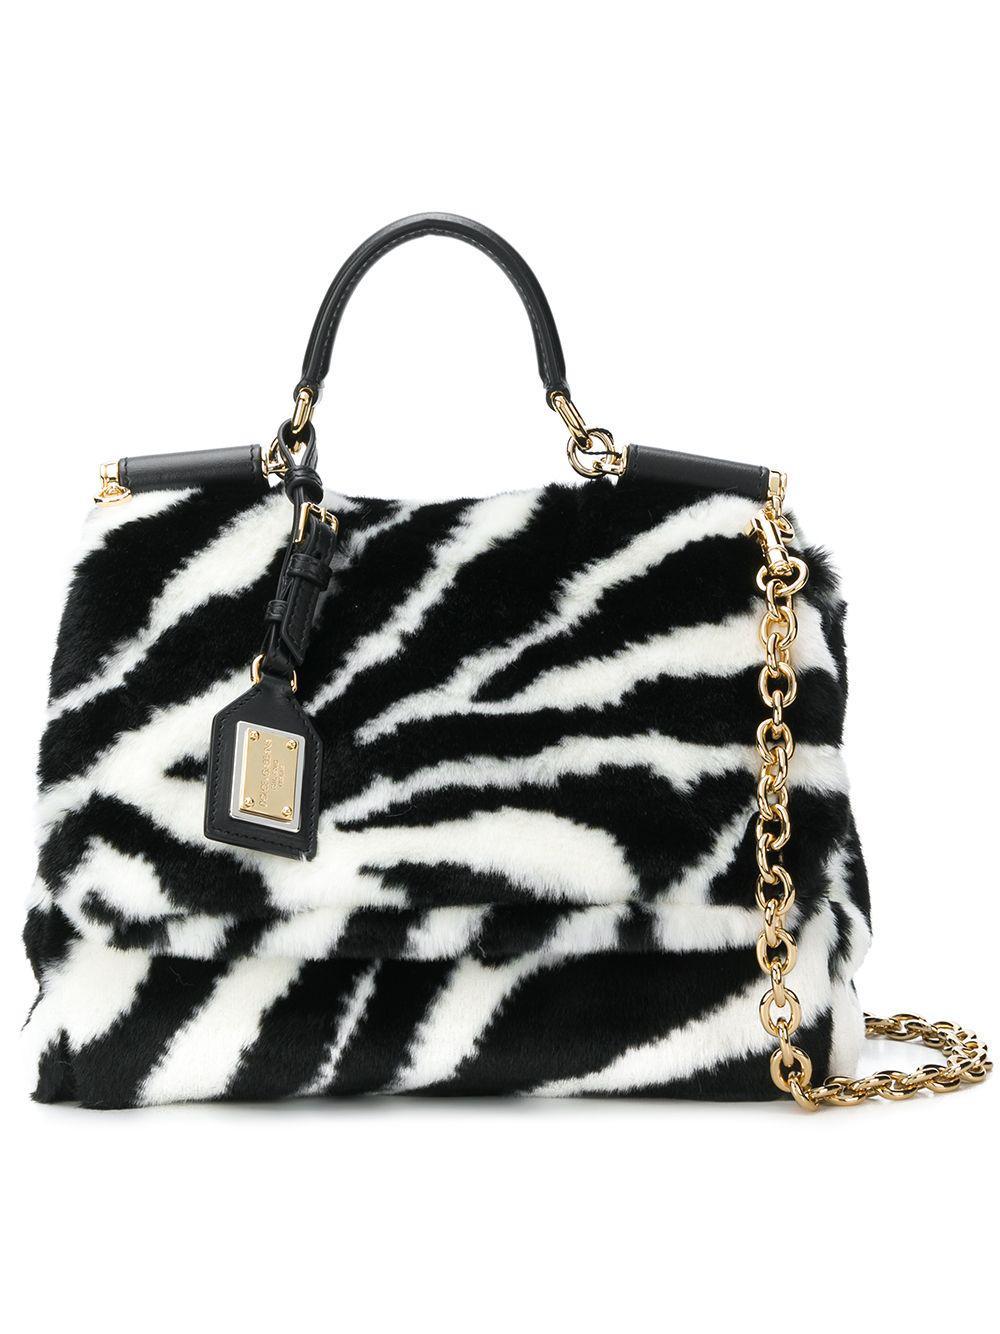 5a7fd6d3f1 Dolce   Gabbana Miss Sicily Zebra Print Fur Handbag in White - Lyst